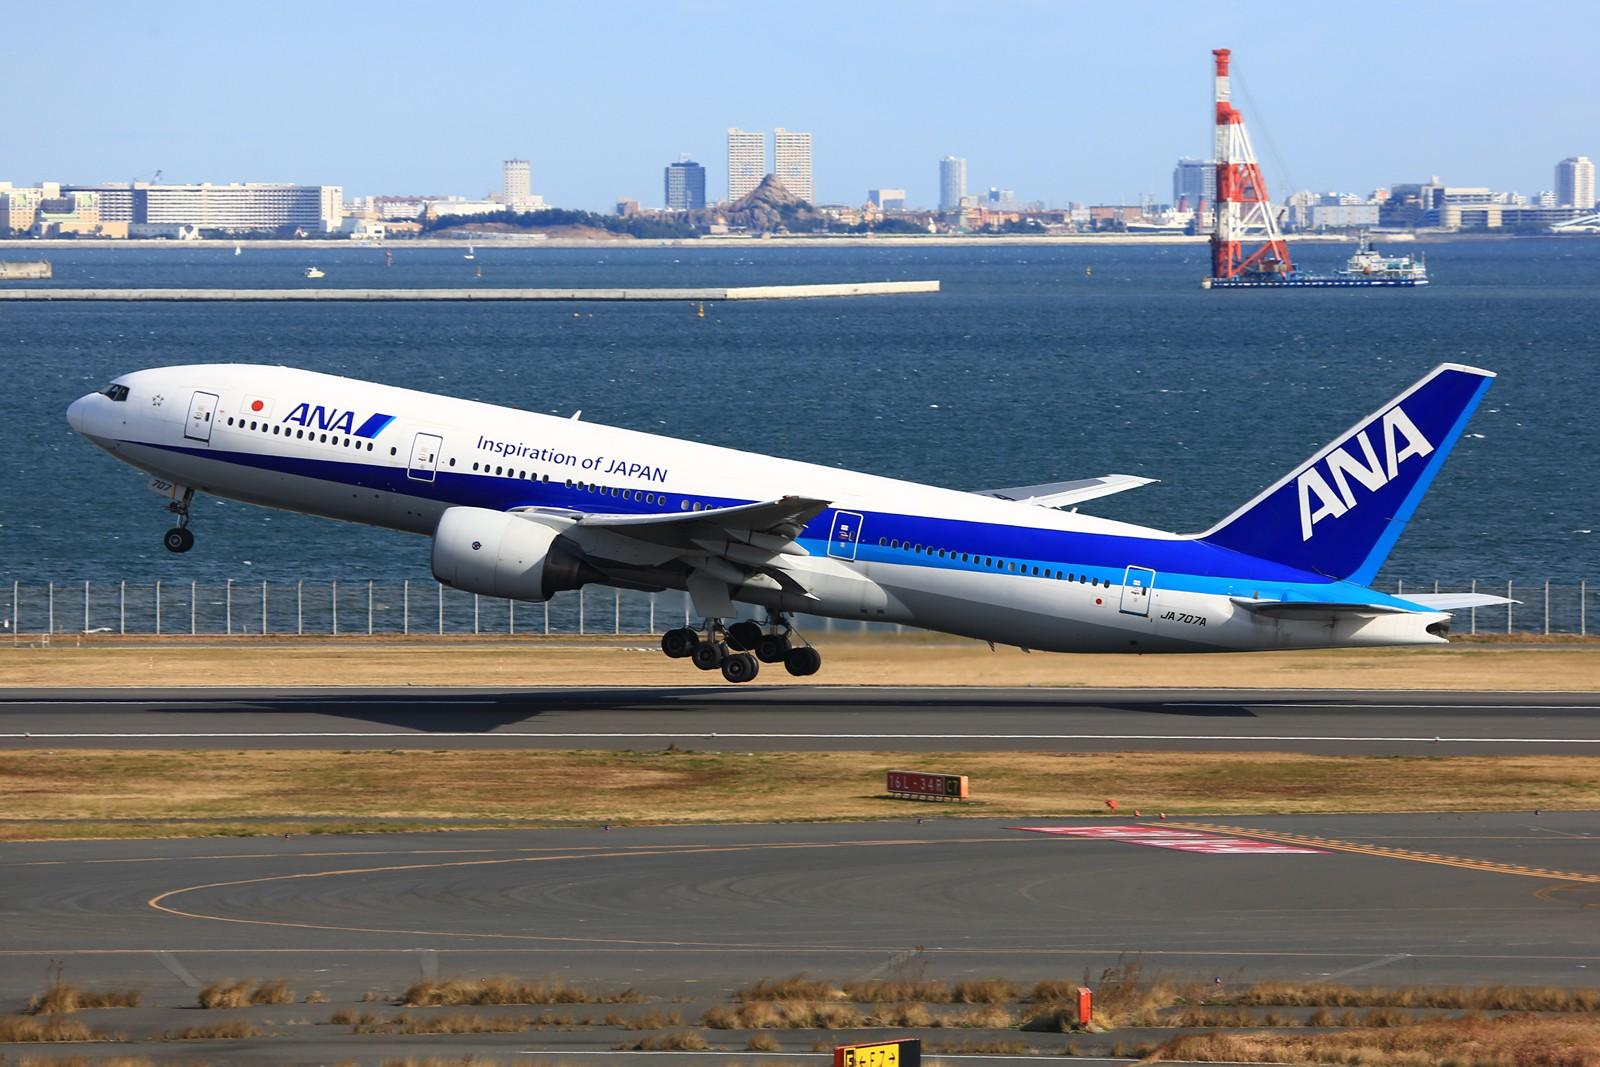 Re:[原创]【HND】******2016新年好,流窜羽田机场:全日空星战,汉莎1500th,以及一些大路货****** BOEING 777-200 JA707A 日本东京羽田国际机场